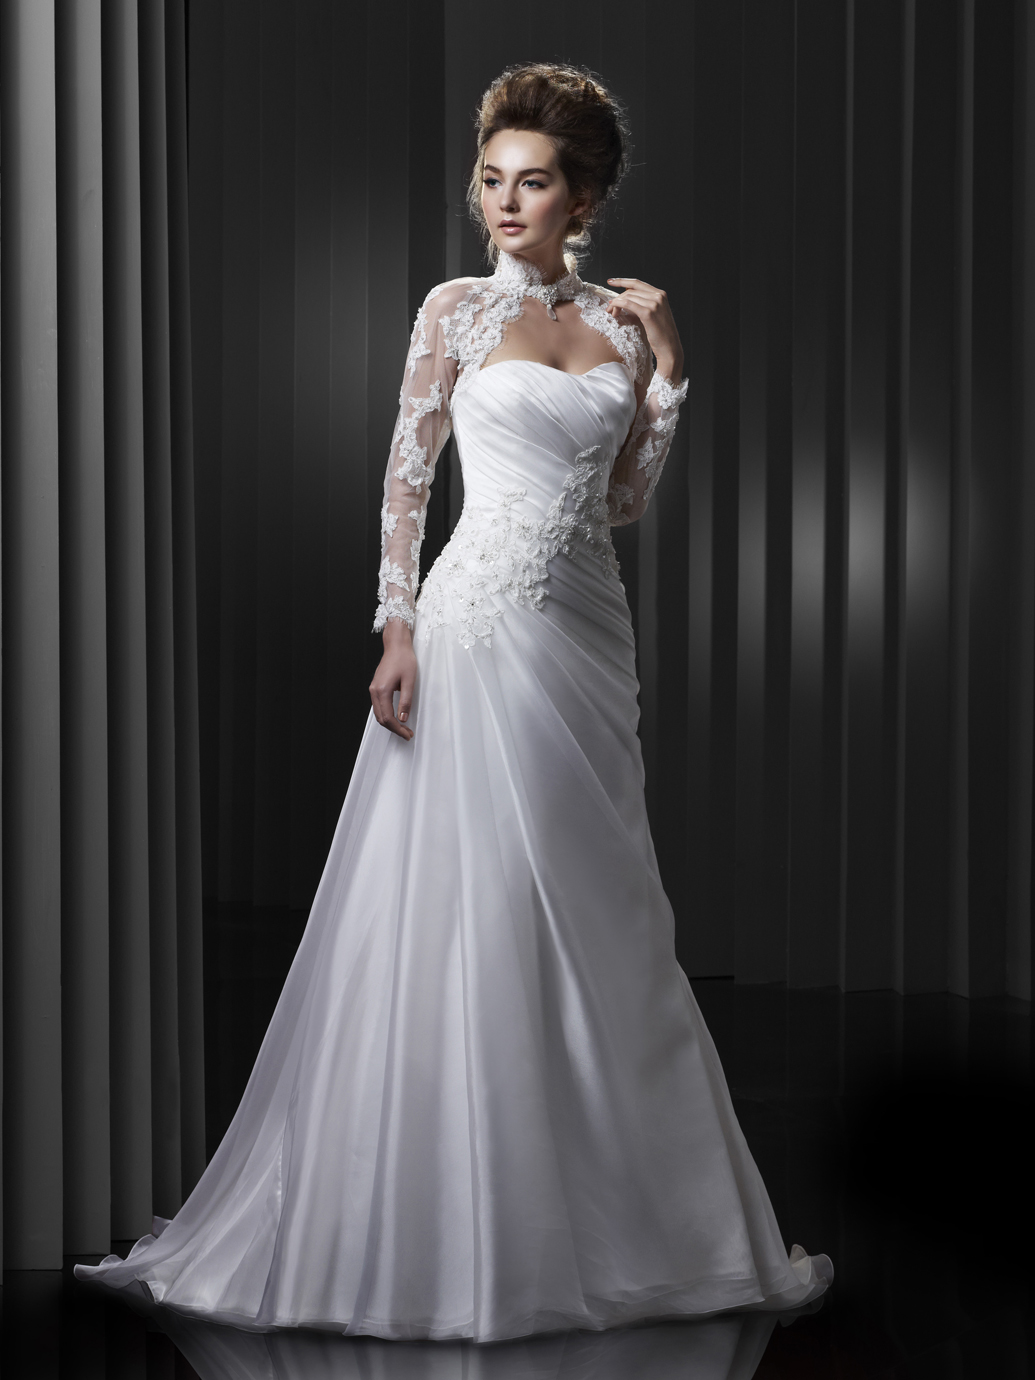 Brautkleid Enzoani A-Linie mit einem Bolero